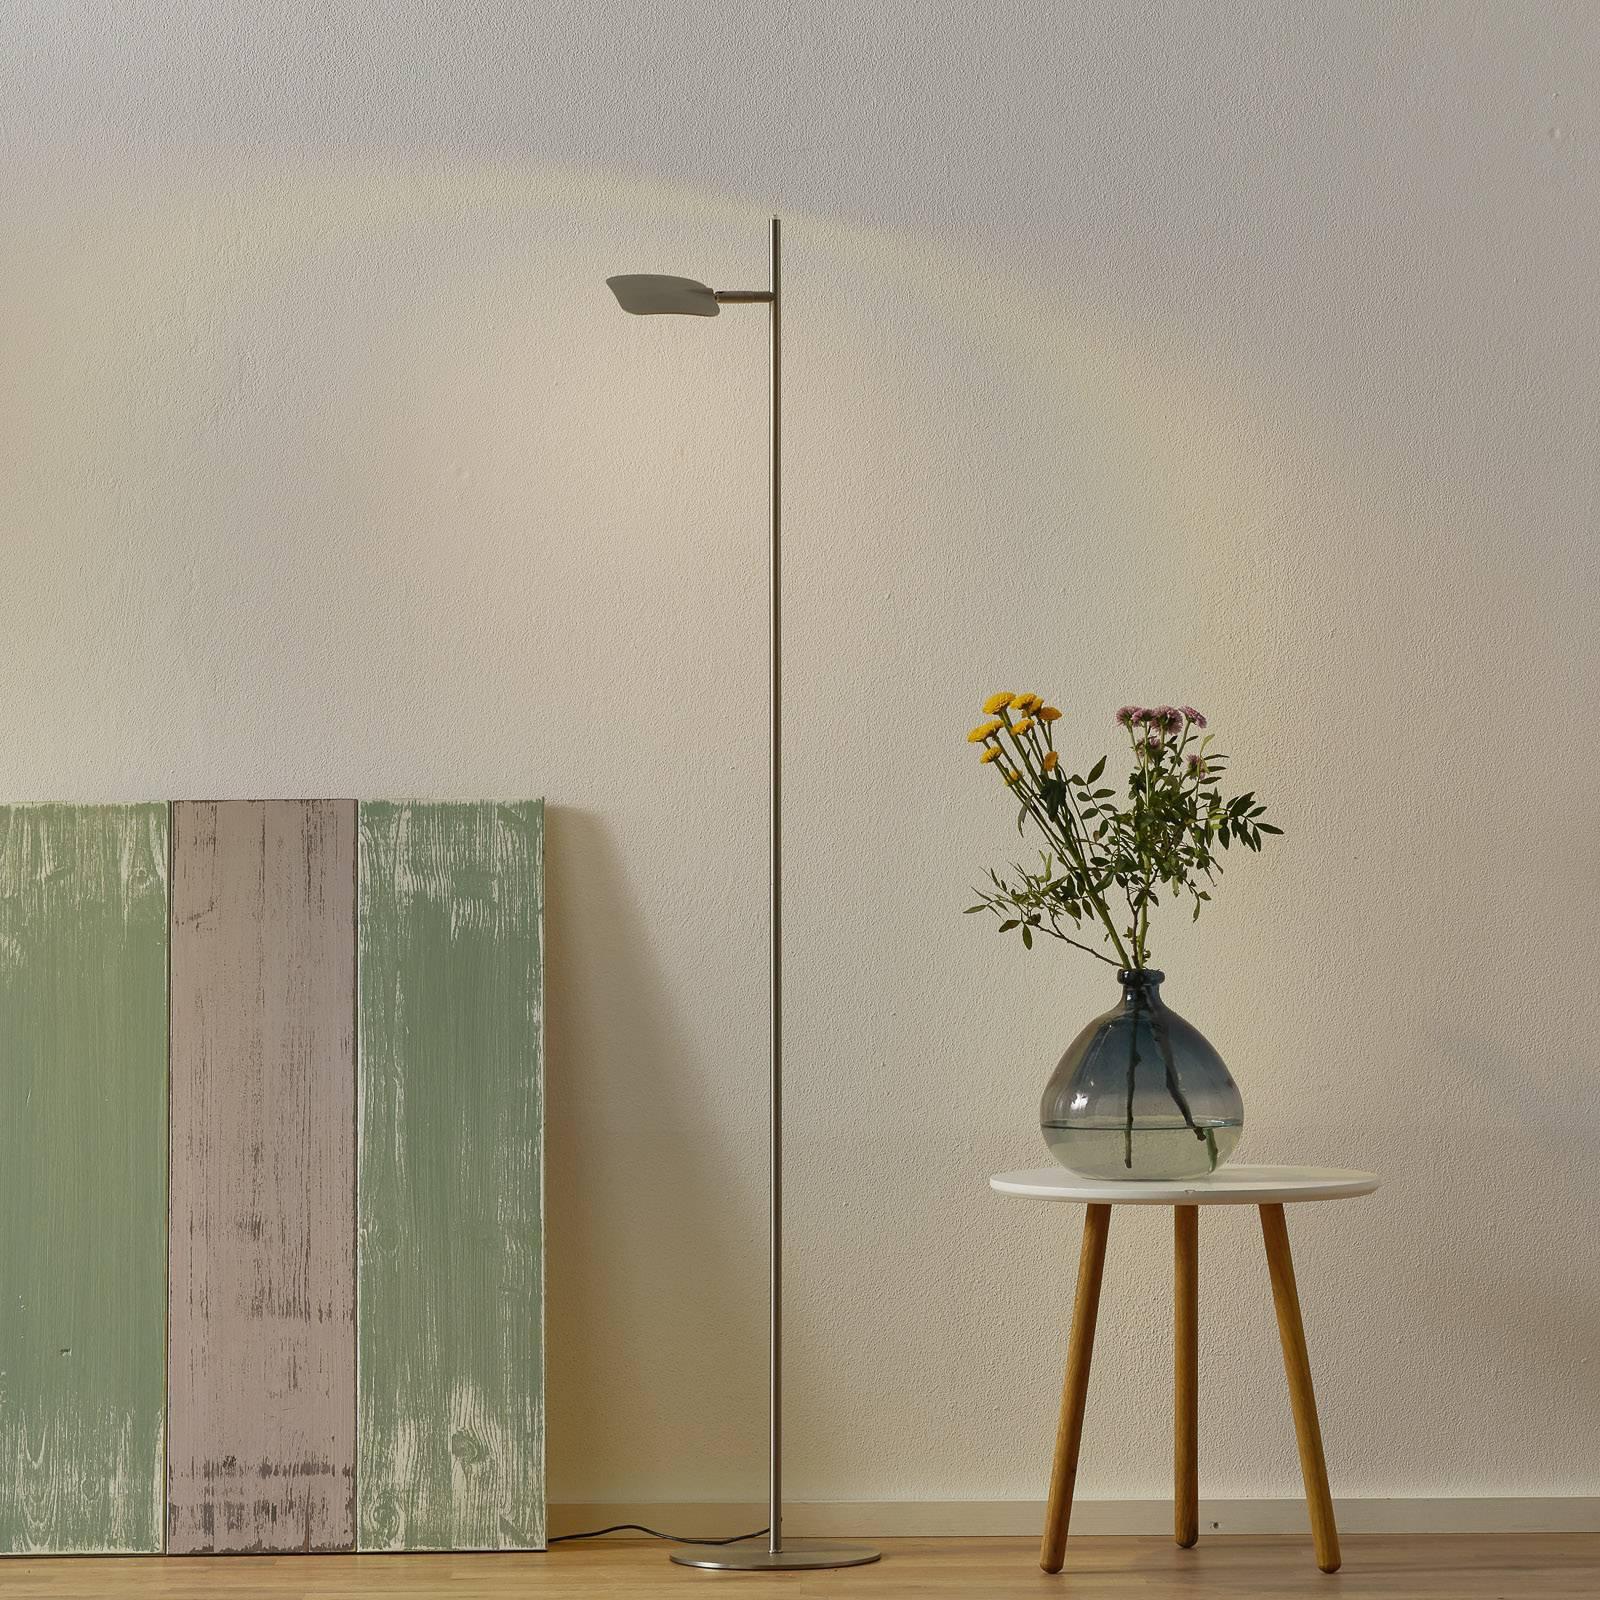 LED-gulvlampe Raggio, 1 lyskilde, stålfarget